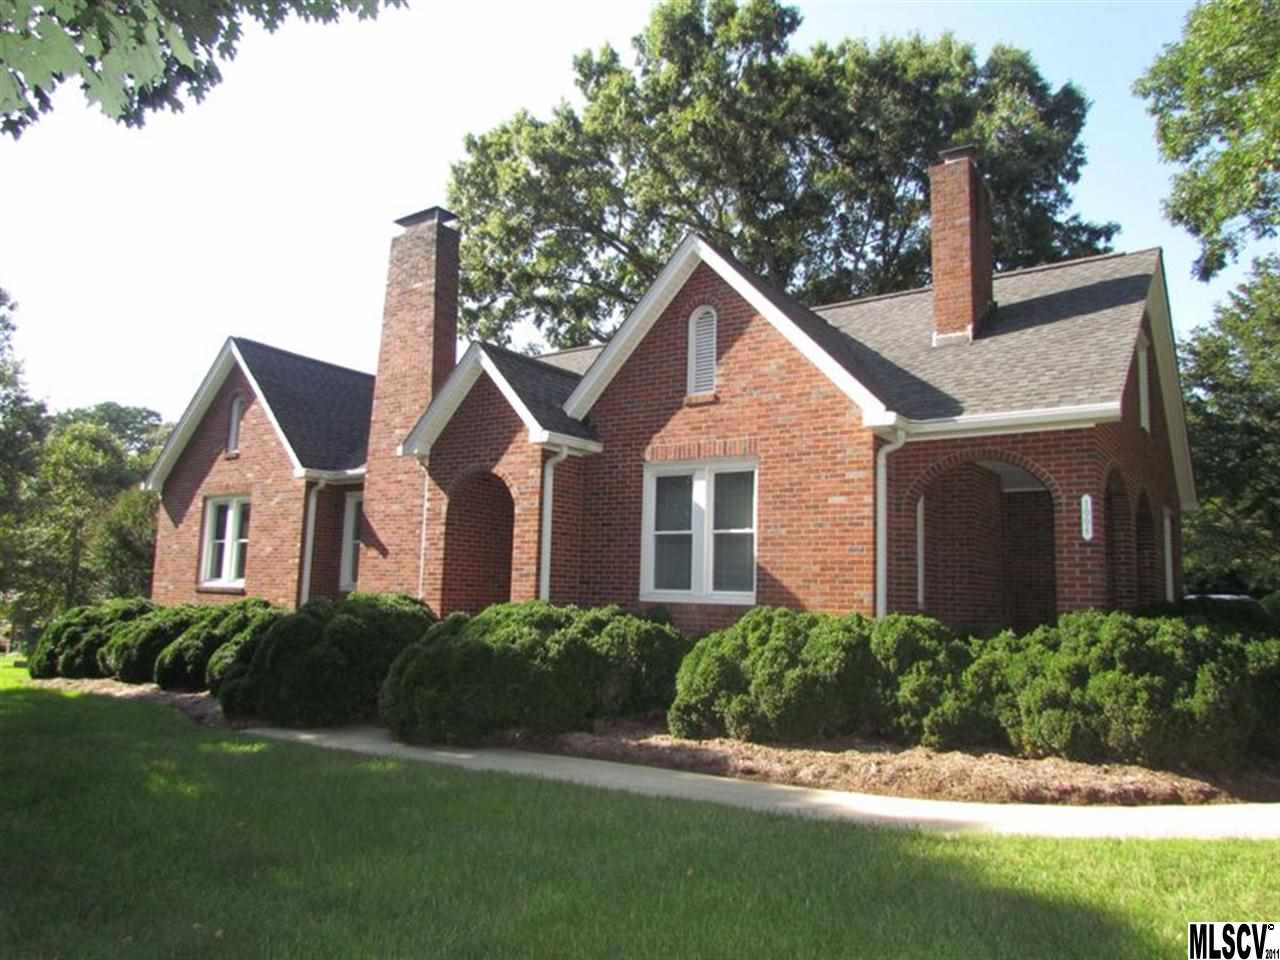 Real Estate for Sale, ListingId: 26404584, Hickory,NC28601